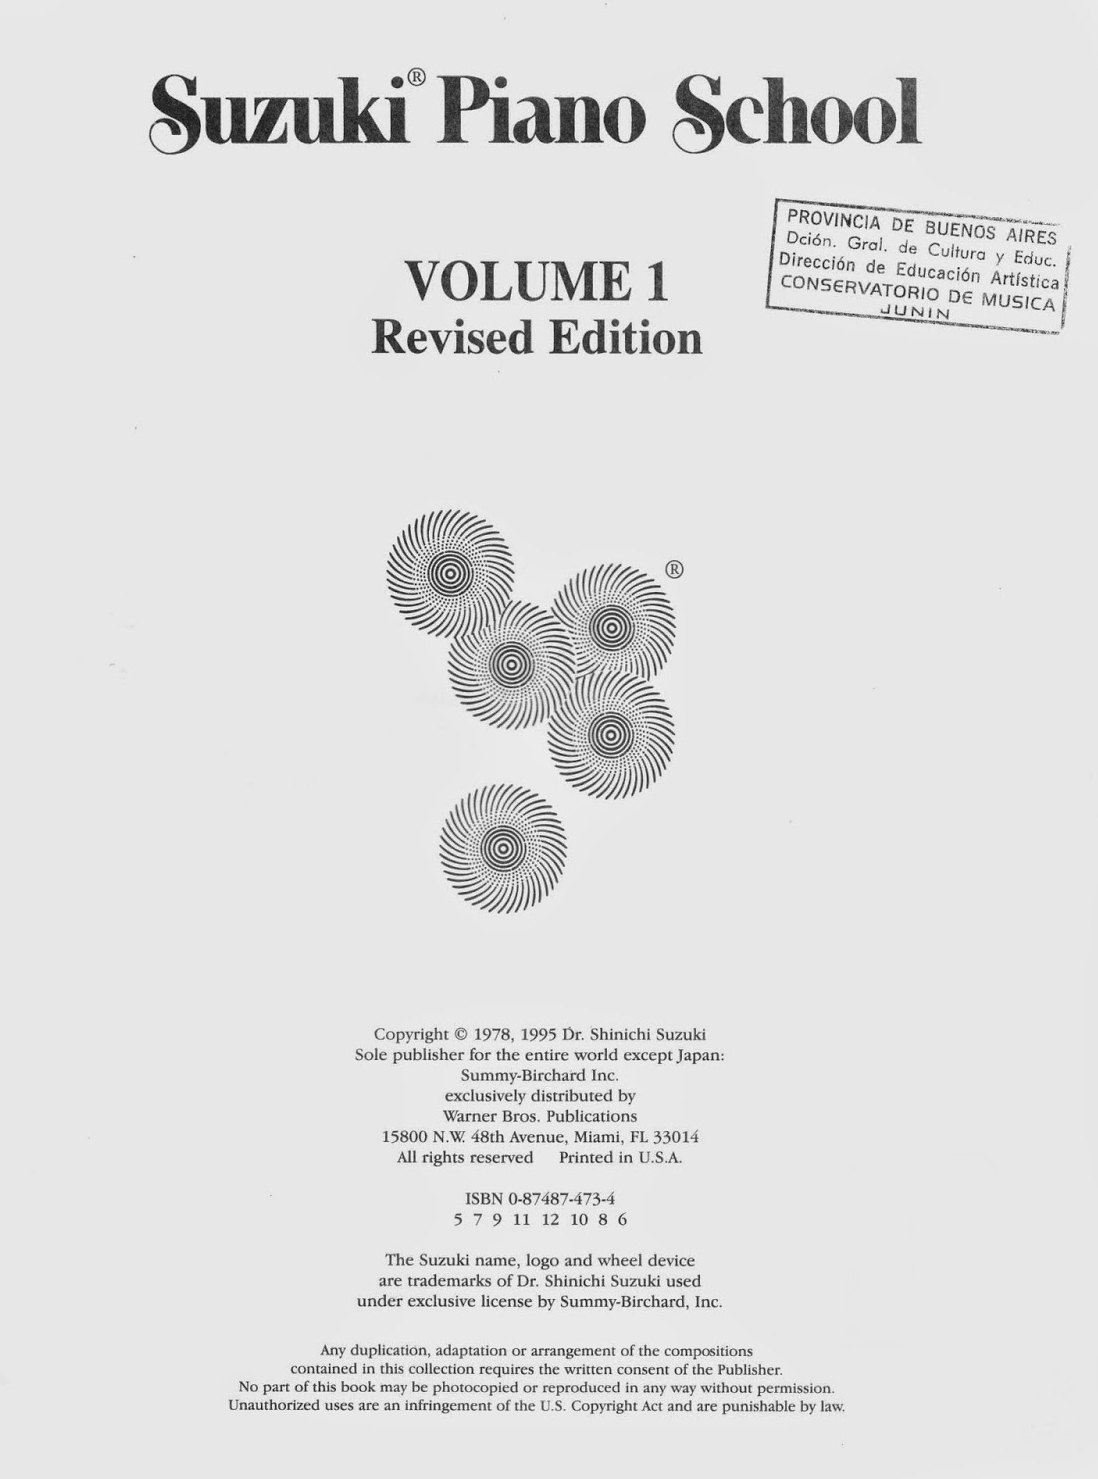 6 7 8 10 5 4 3 9 Suzuki Violin School 10 BOOKS AND 8 CD SET VOLUMES 1 2